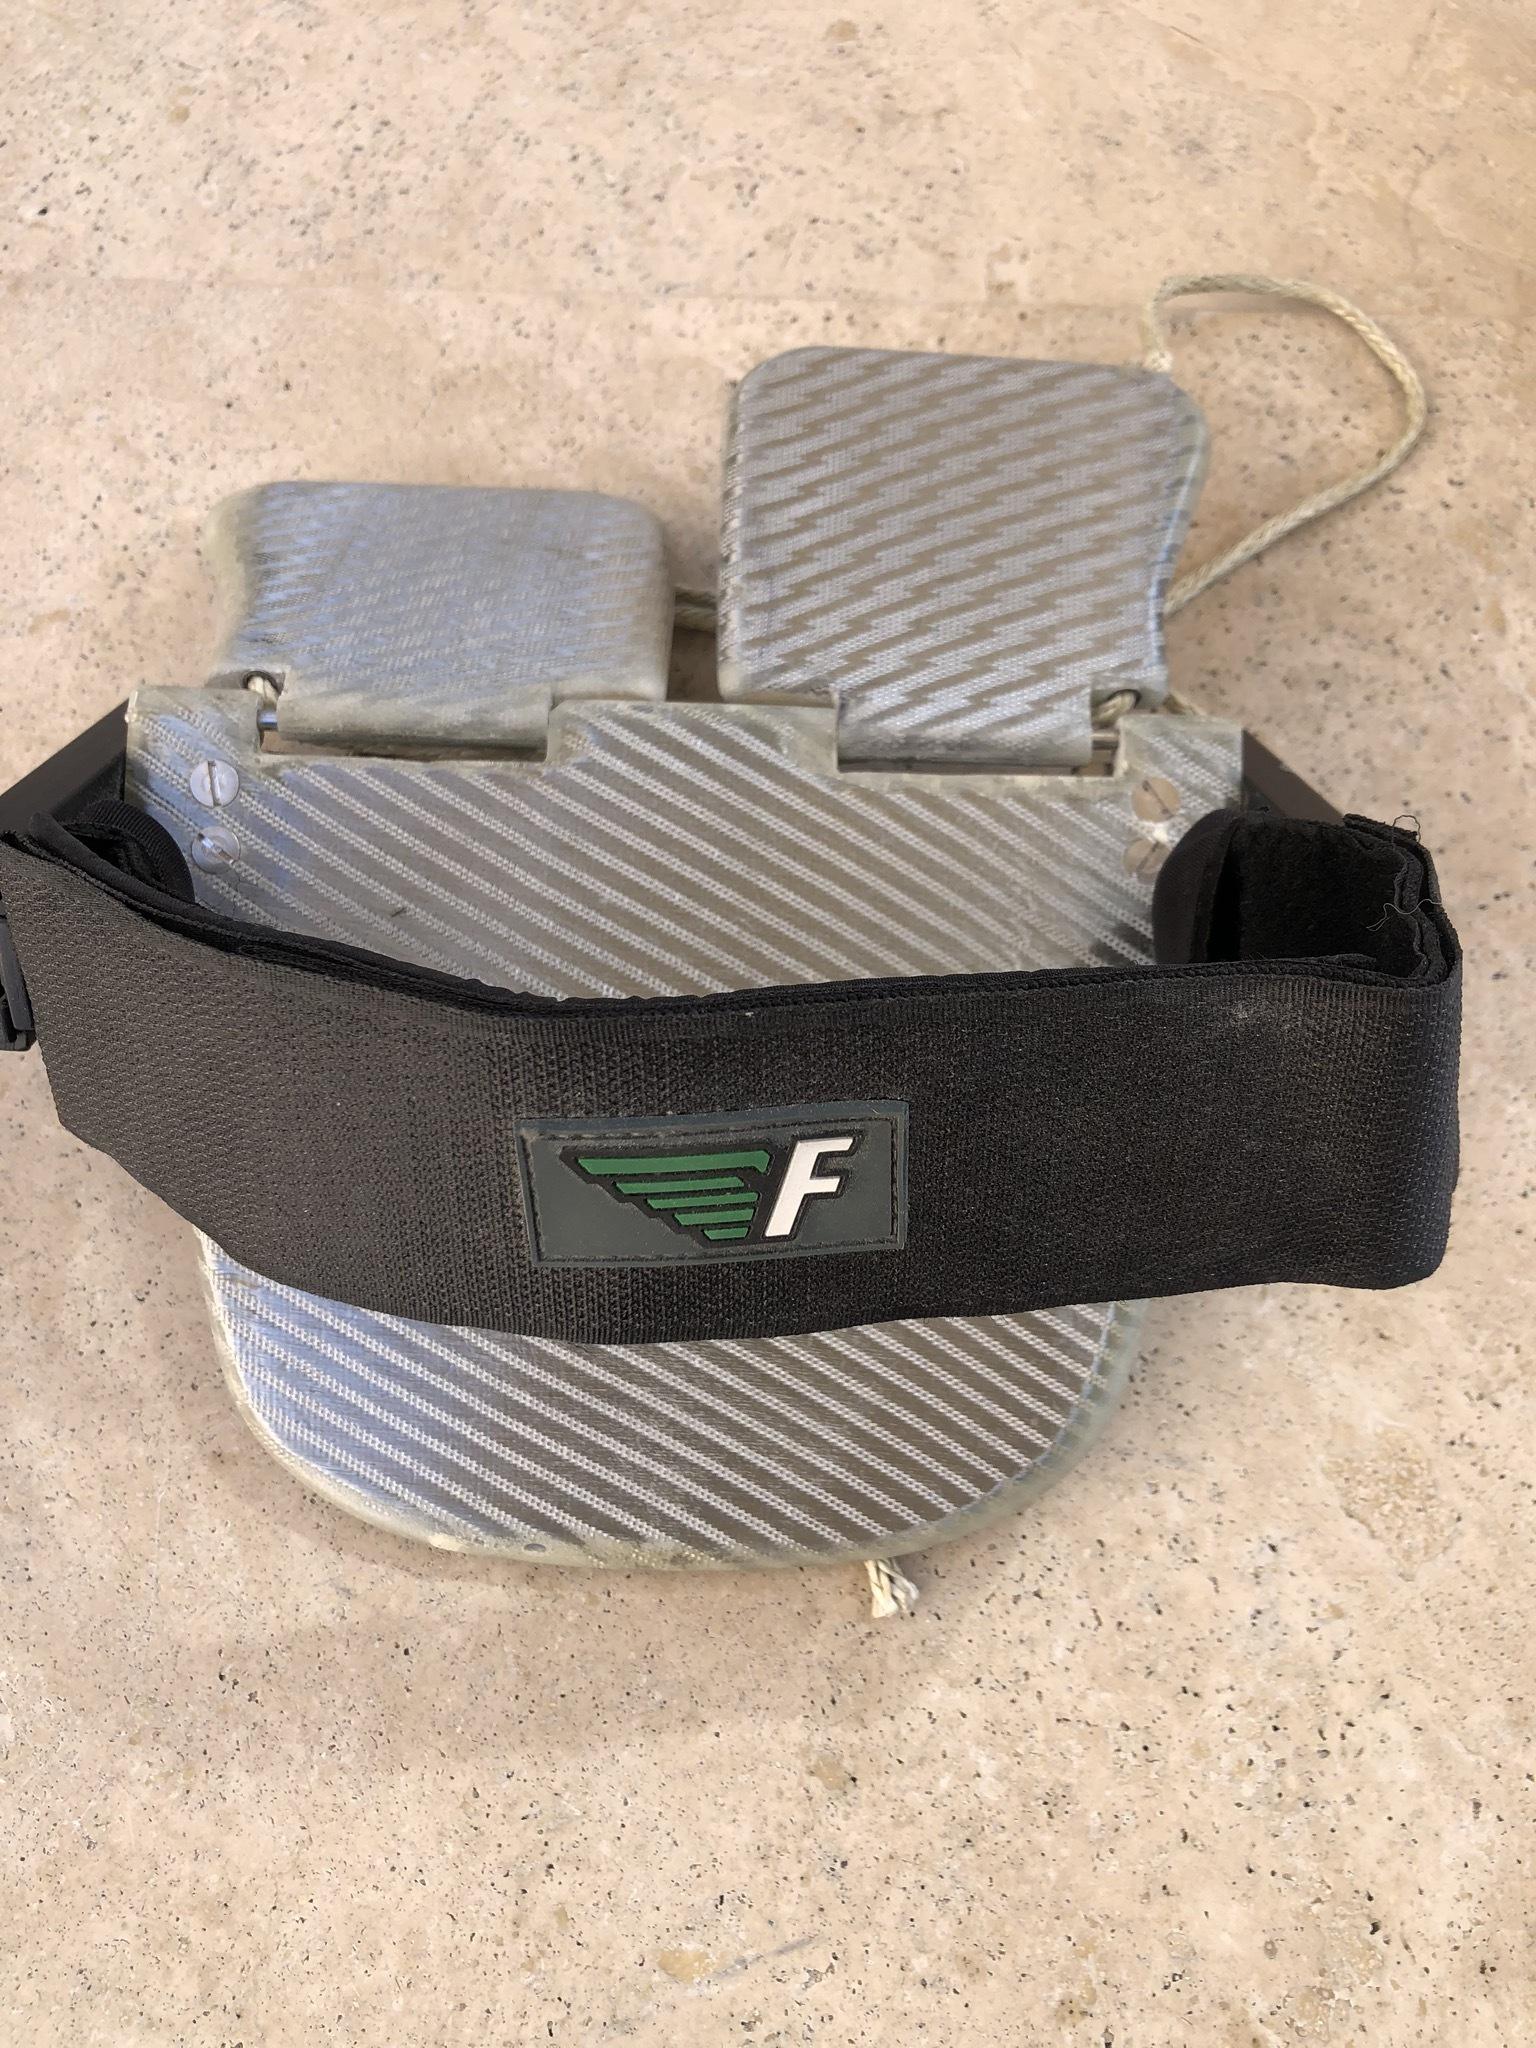 Adjustable FENN Foot Strap 00242